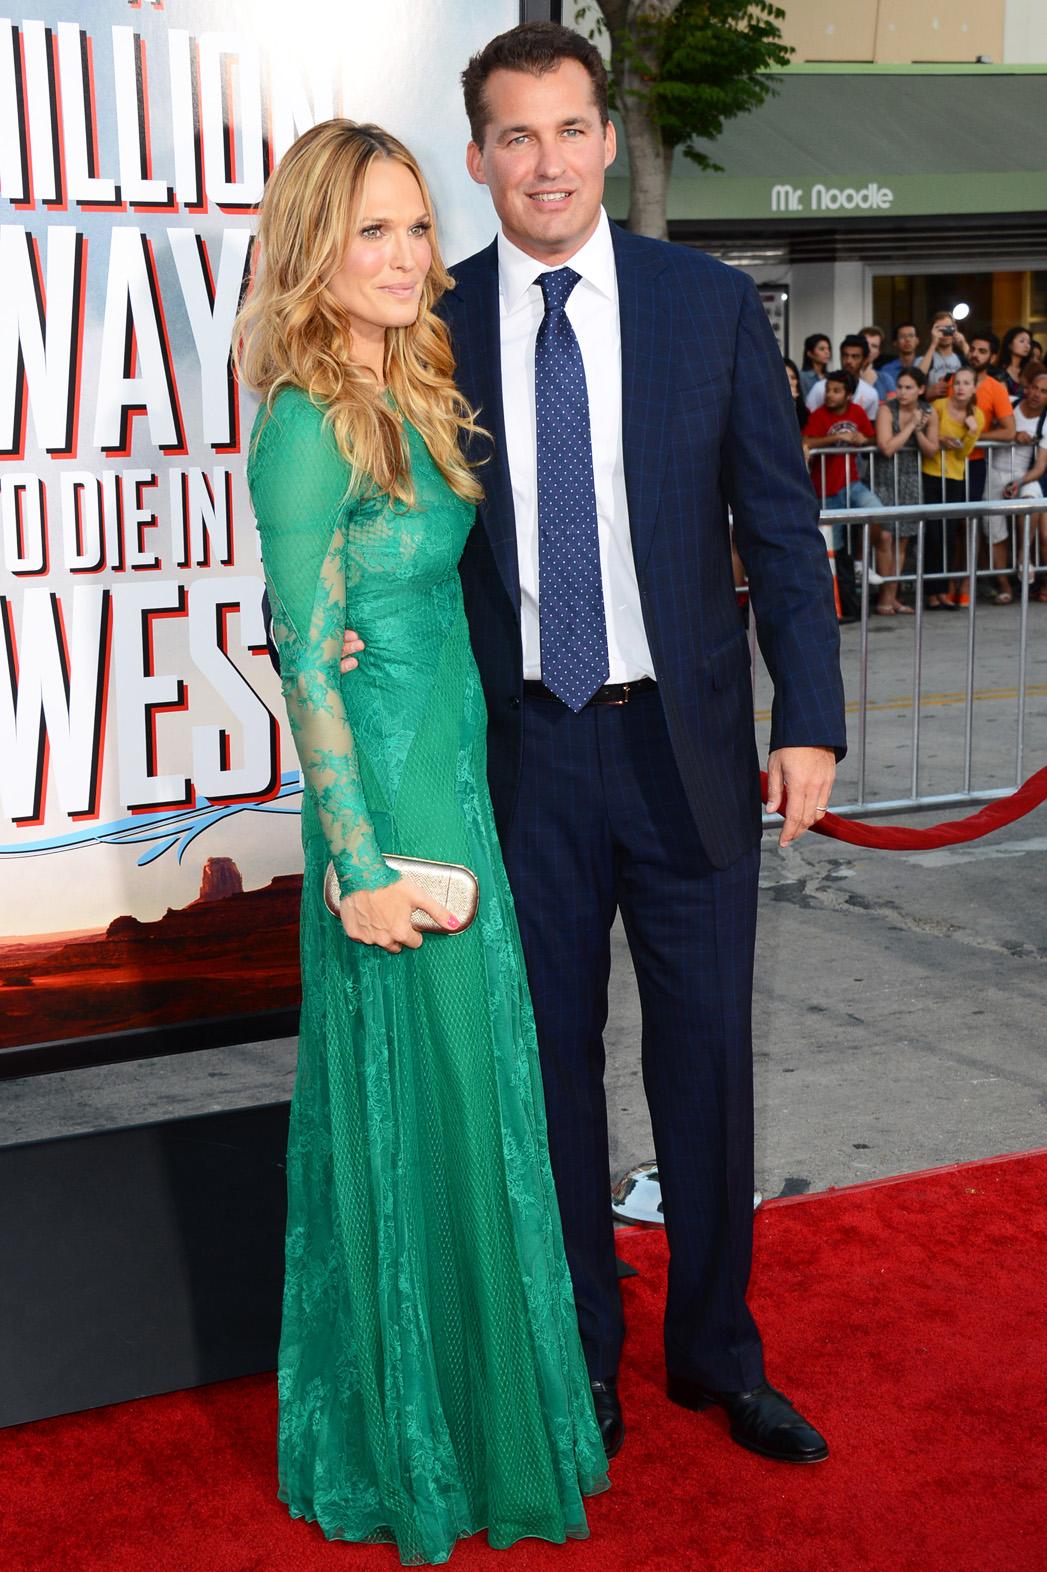 Molly Sims and Scott Stuber